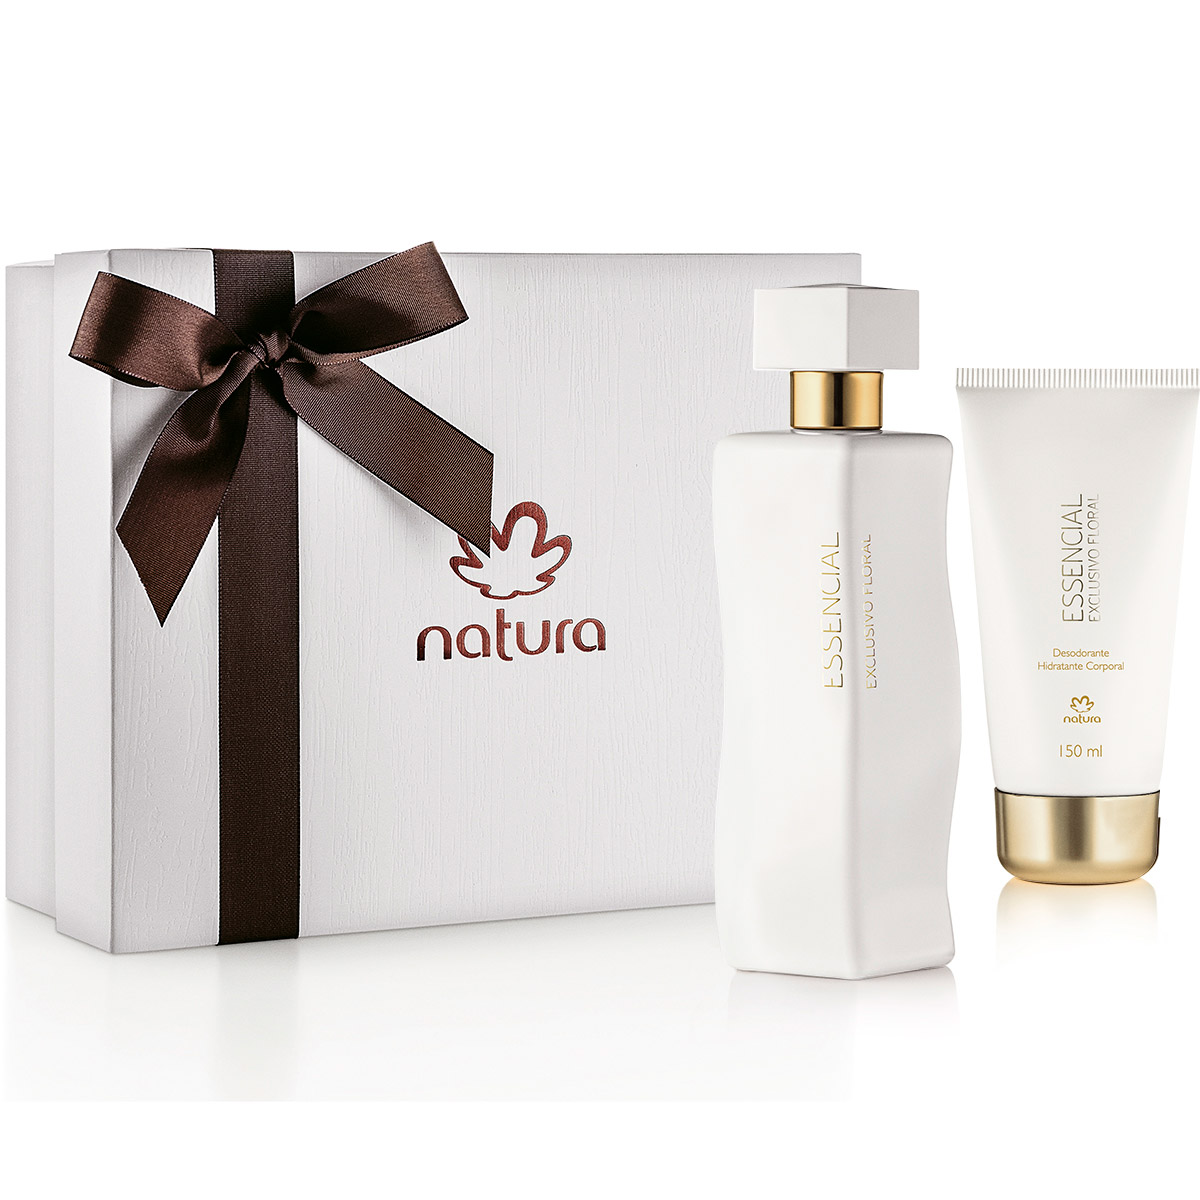 Presente Natura Essencial Exclusivo Floral Feminino - 82539